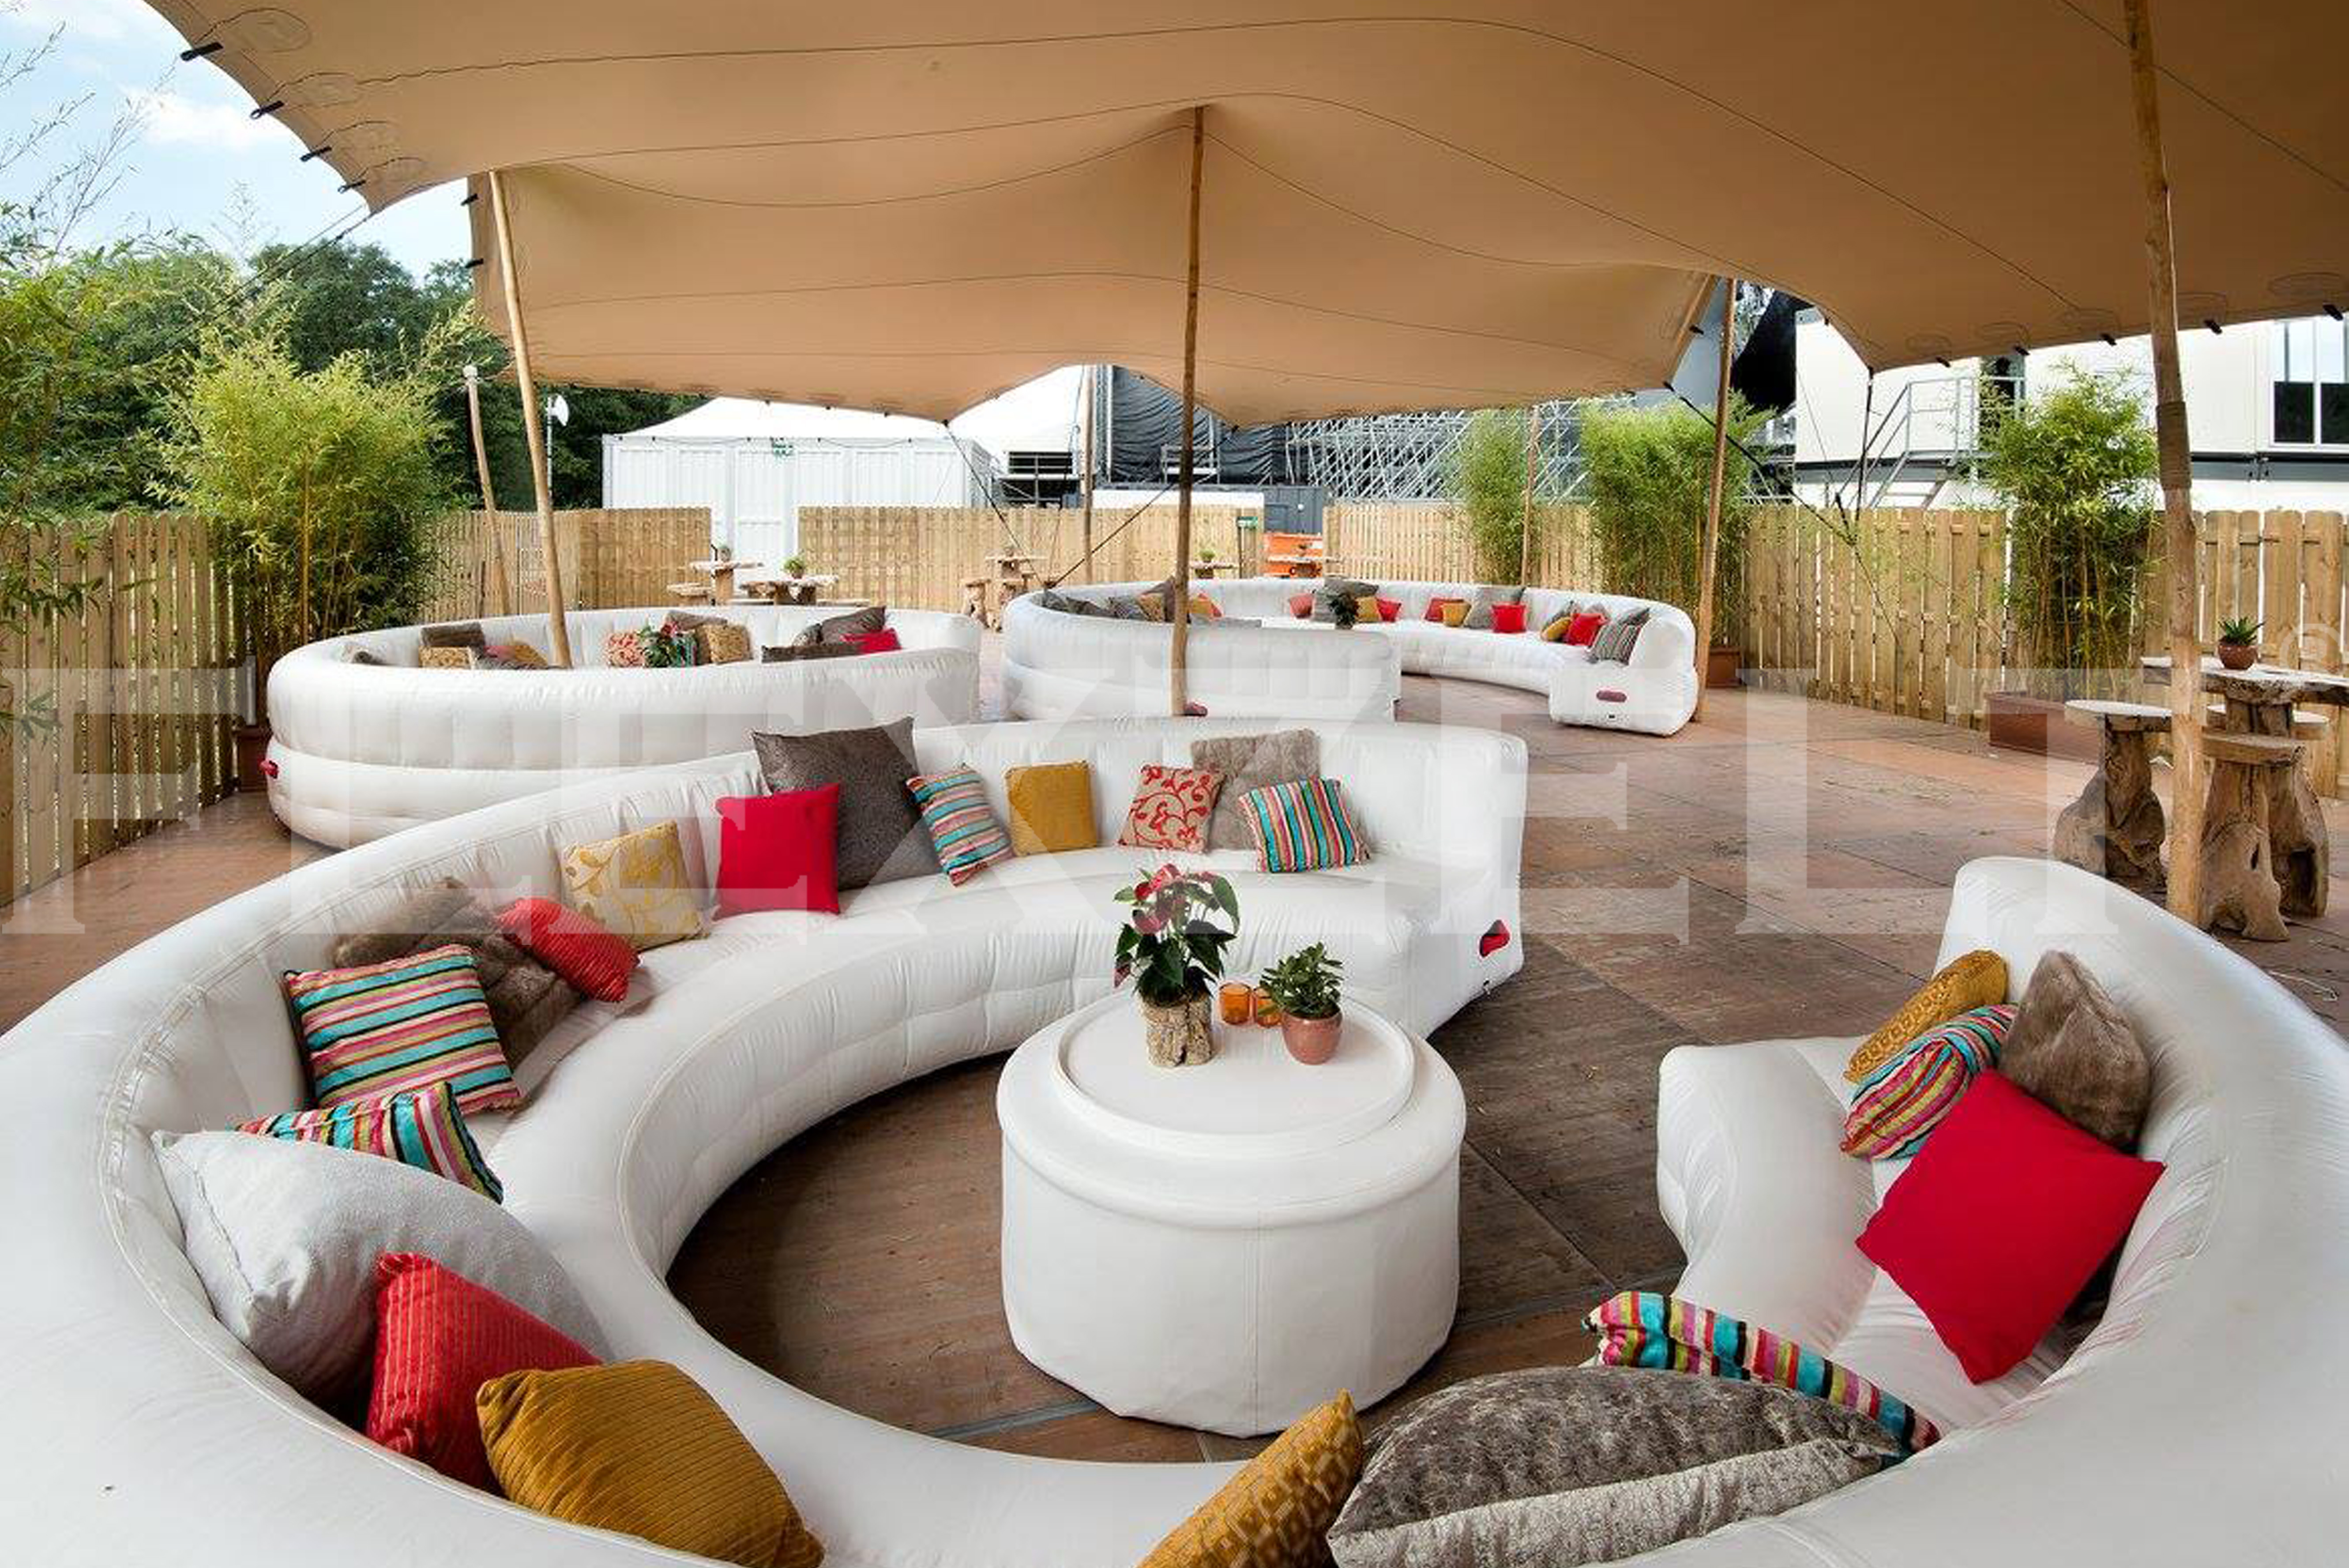 Flexzelt - Flextent - Festival toepassing - Lounge - VIP Area